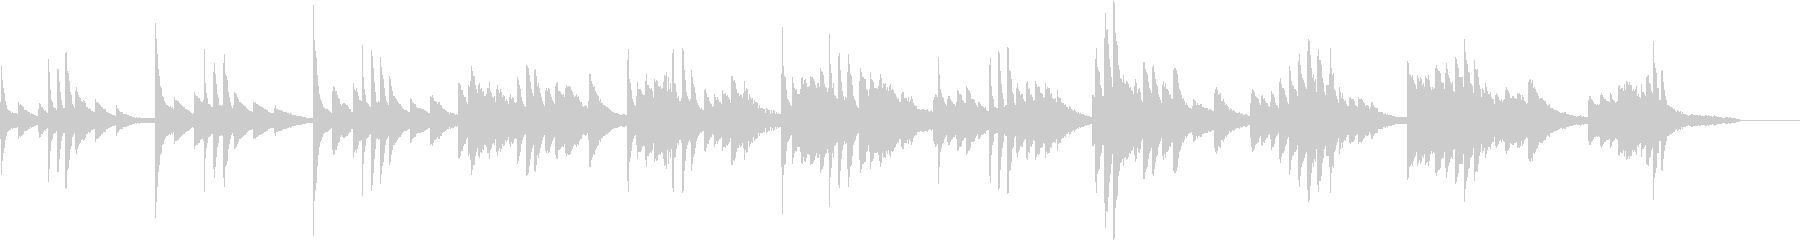 BGM用寂しいピアノの未再生の波形